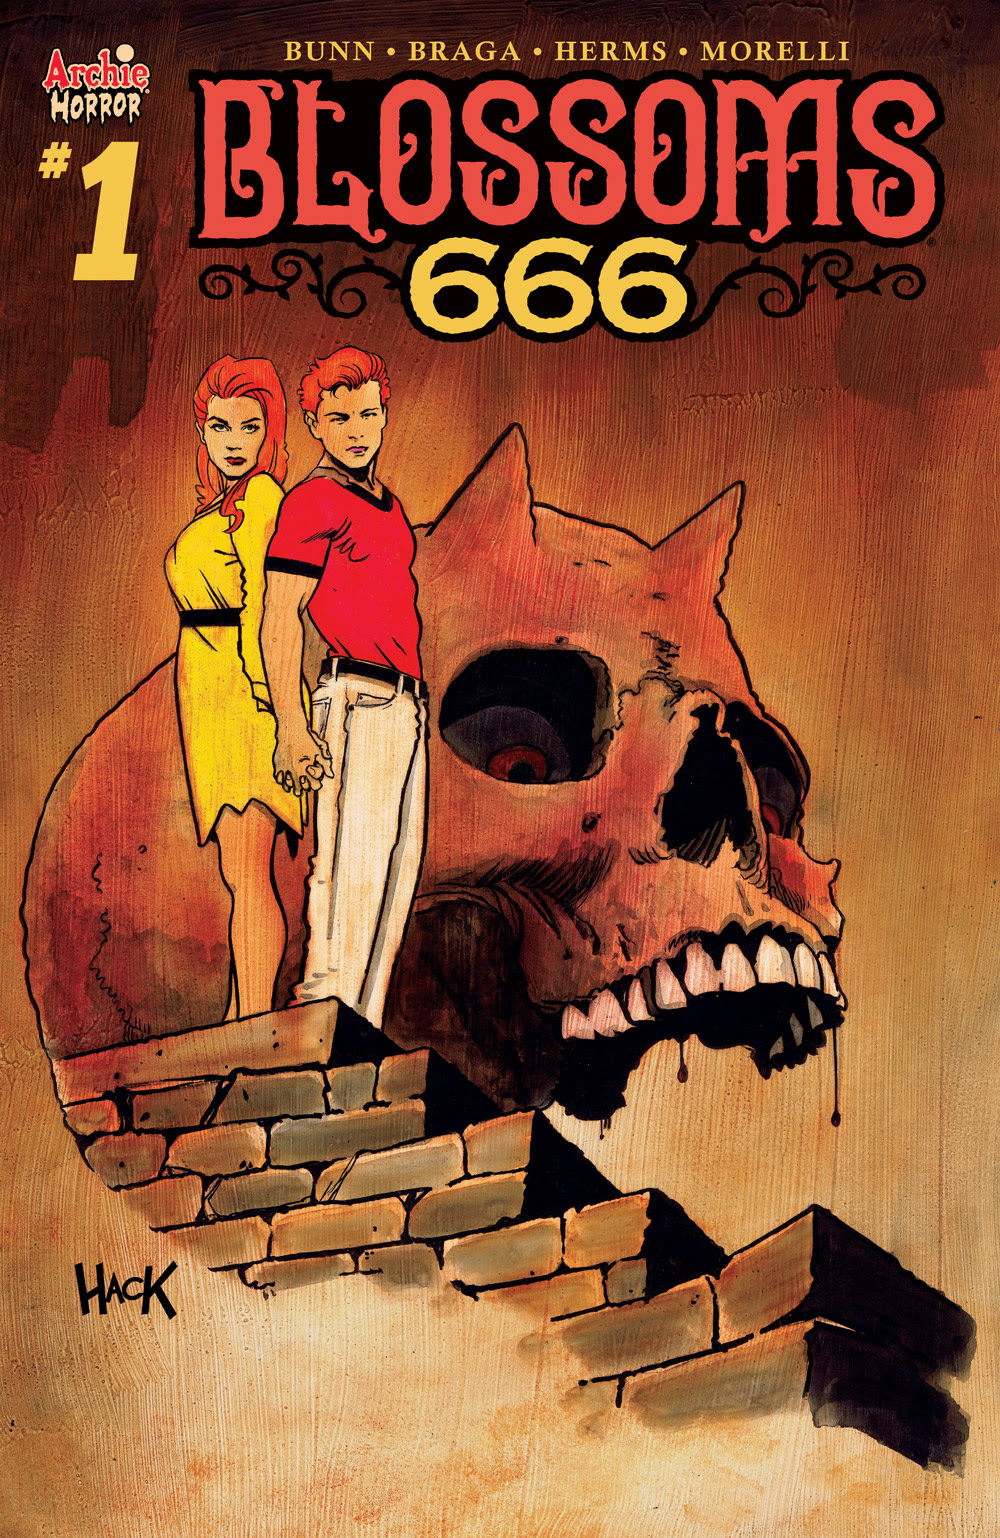 BLOSSOMS 666 #1: CVR D Hack